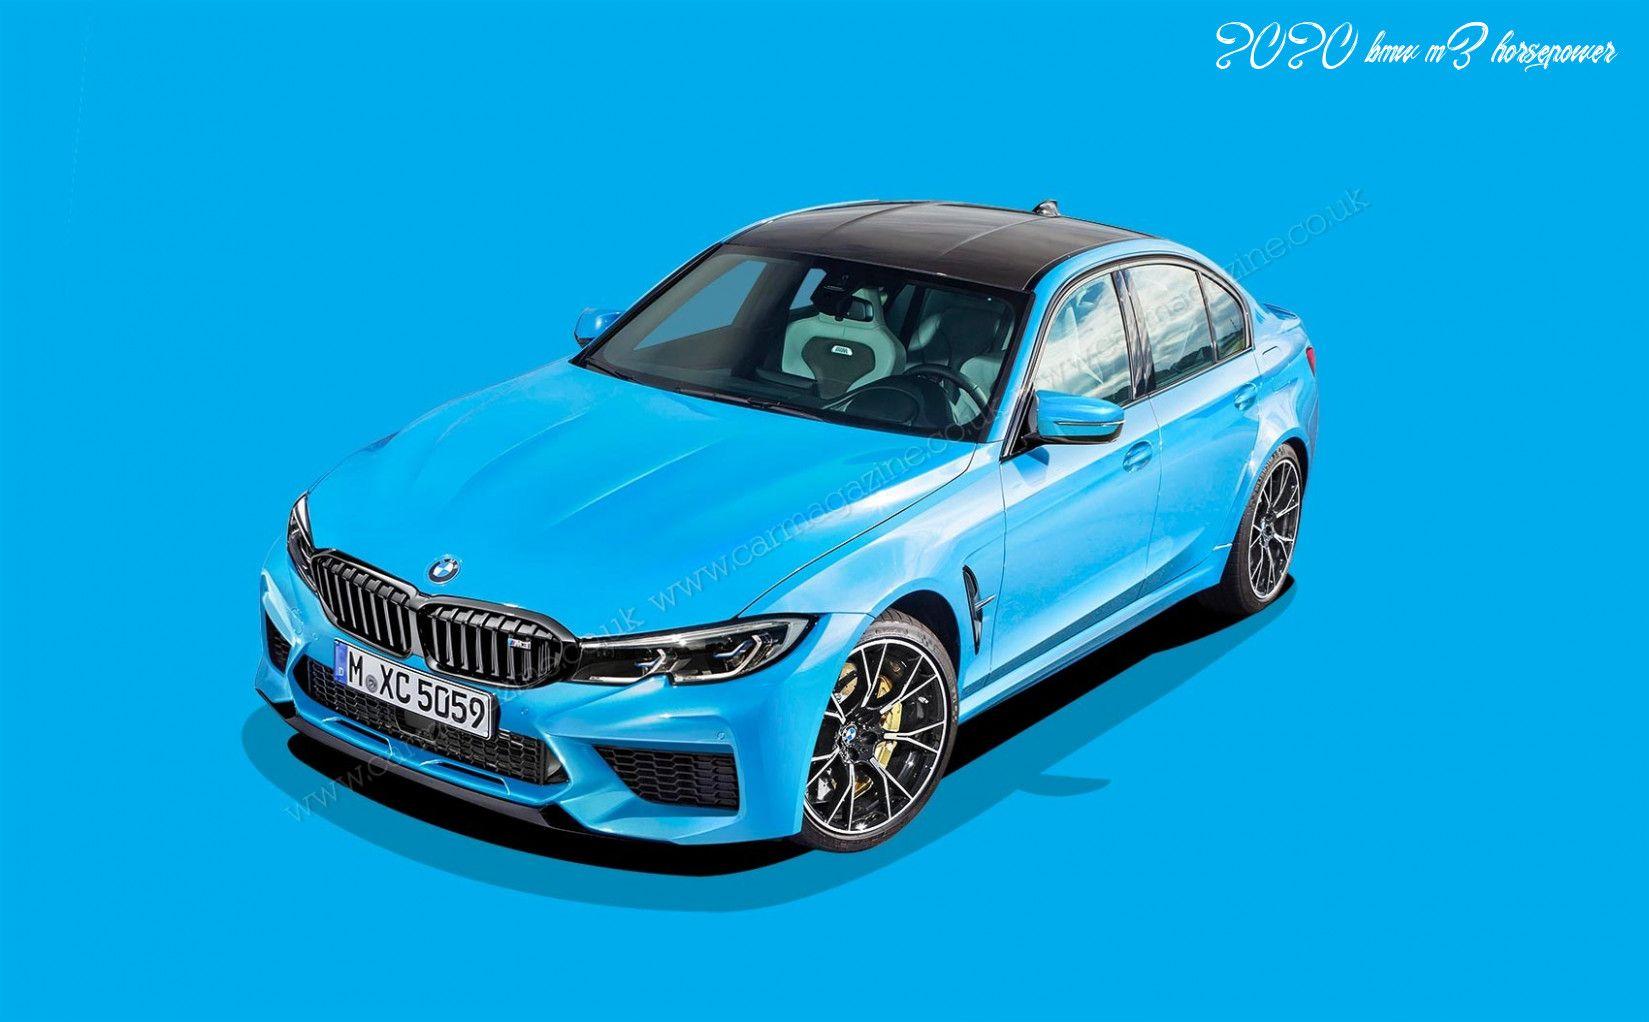 2020 Bmw M3 Horsepower Performance In 2020 Bmw Bmw M3 Bmw Cars